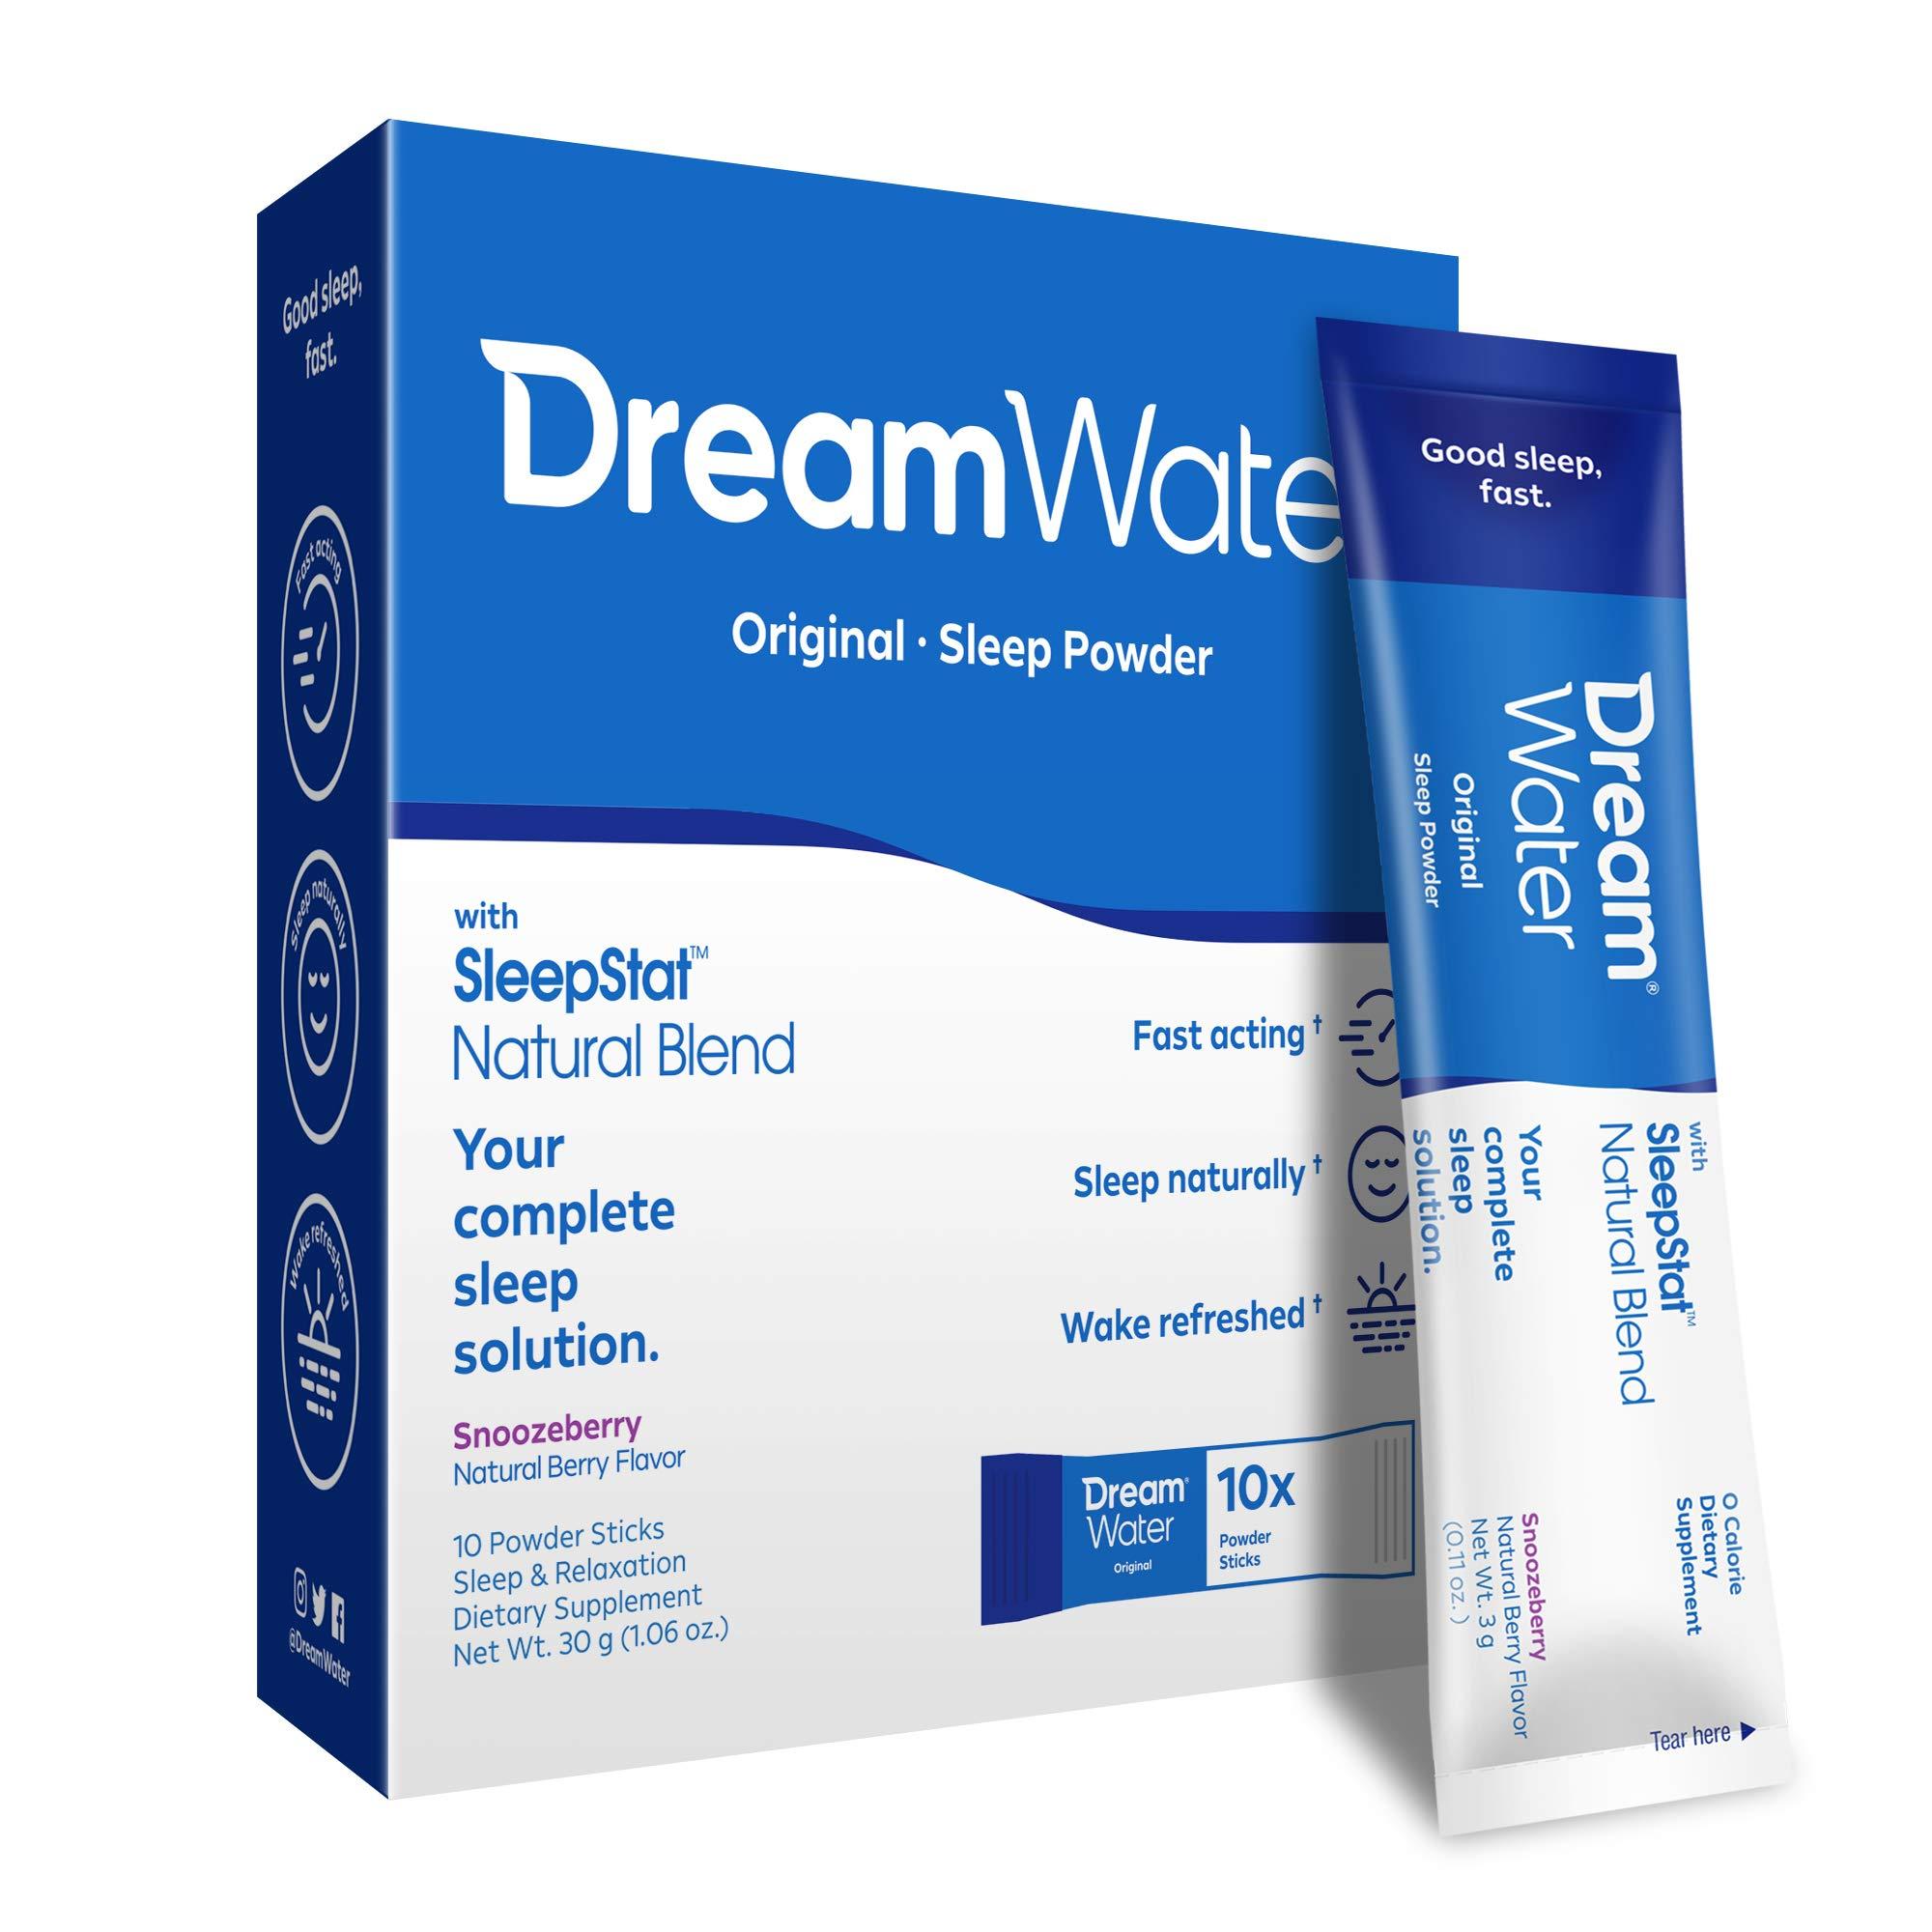 Dream Water Sleep Powder, Best Natural Sleep Aid, Melatonin, GABA, 5-HTP, Snoozeberry - 10 Count, Top Rated - Non-Habit Forming